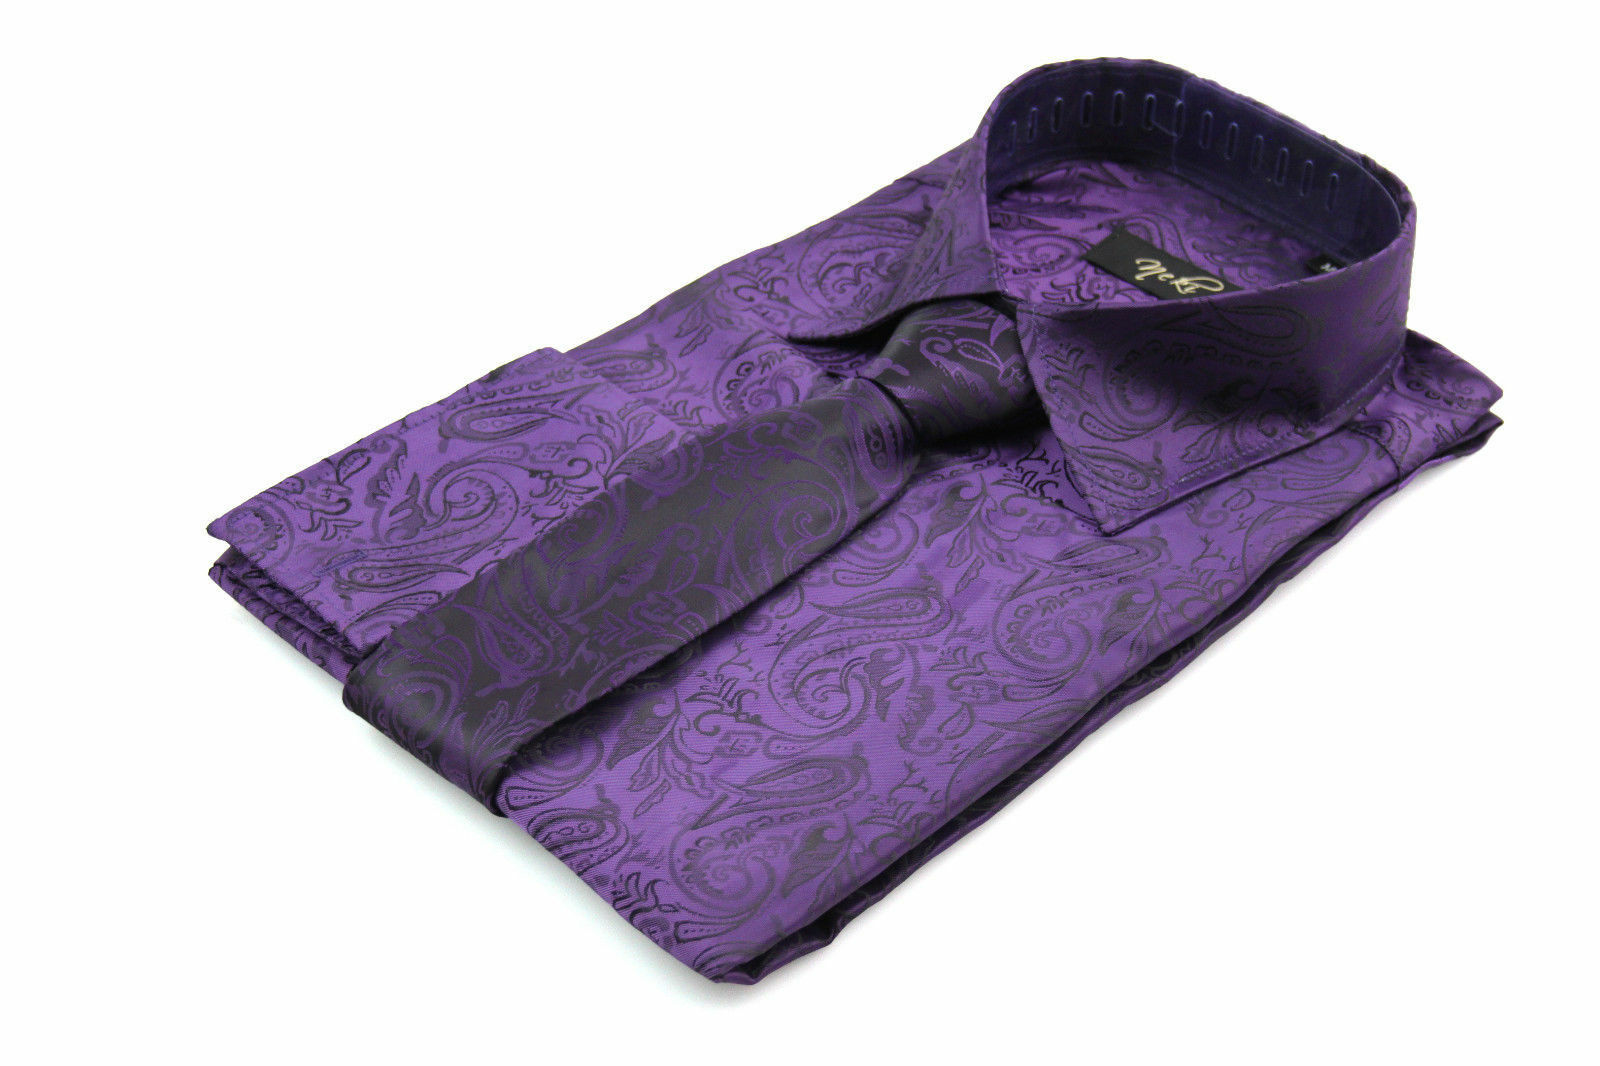 Herren lilat Paisley Seide Satin Look Look Look Oberhemd Alle Größen S M L XL XXL 3XL       Abgabepreis  c60431